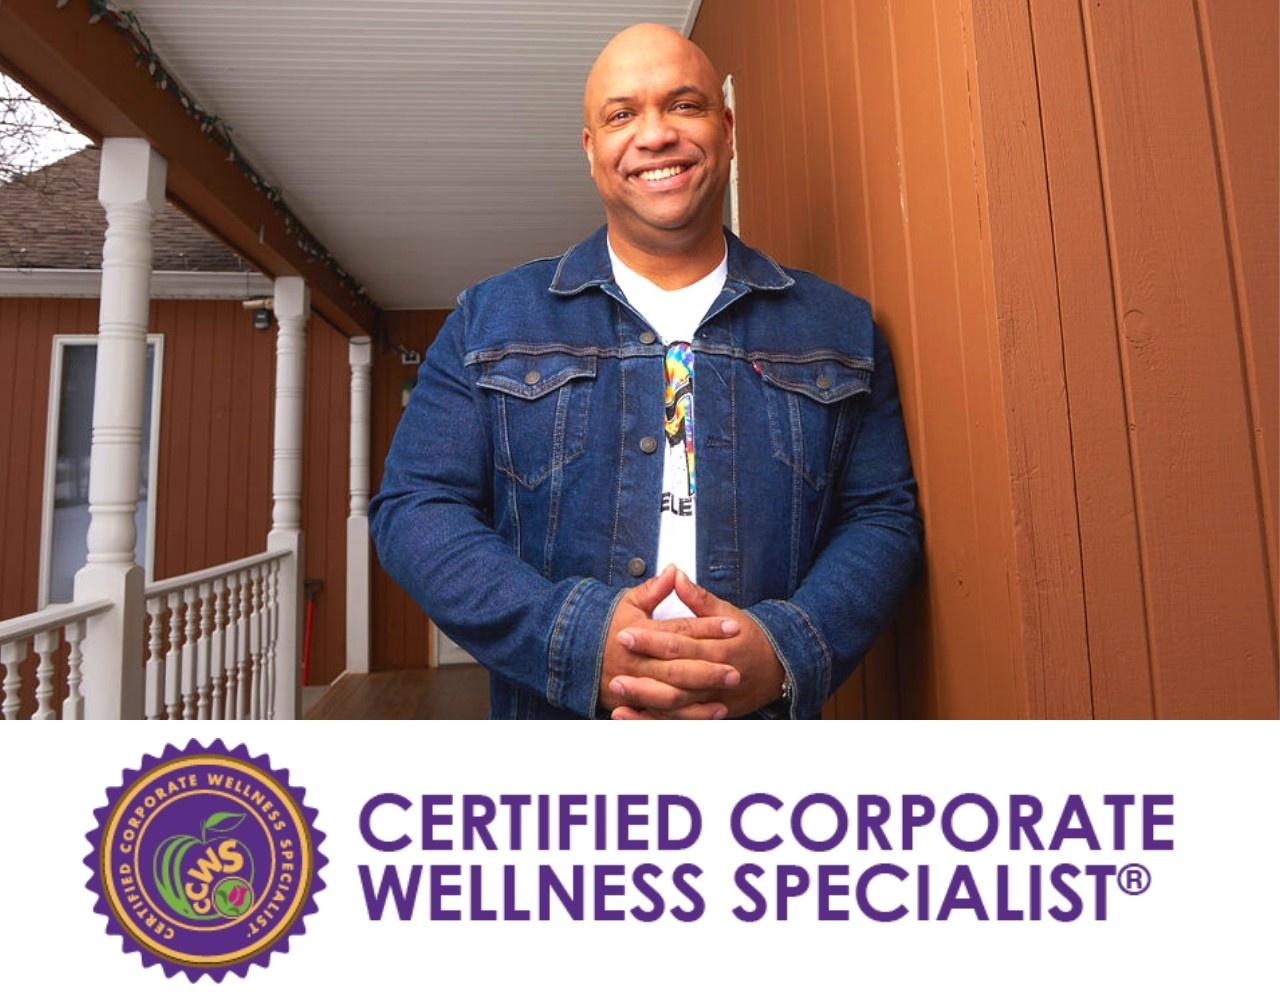 Mike Veny Certified Corporate Wellness Specialist